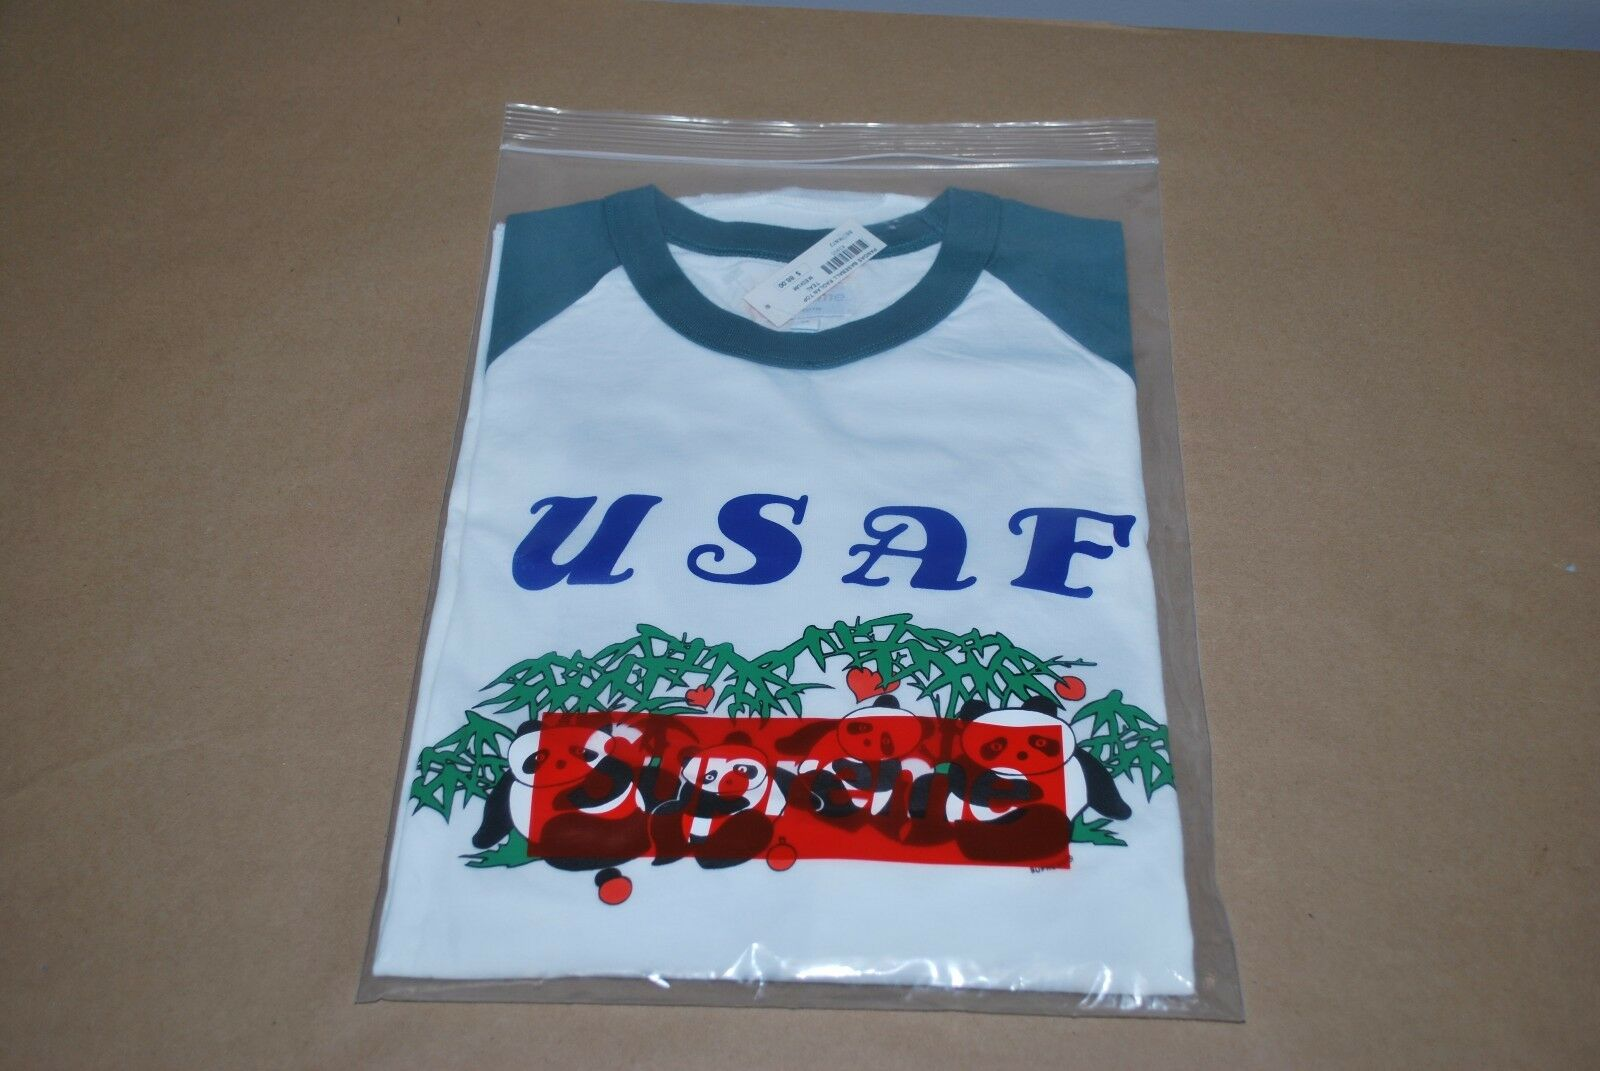 Brand Nuovo Supreme Pandas Baseball Raglan T-Shirt S/S S/S S/S 17 Uomo - Medium 2e5712